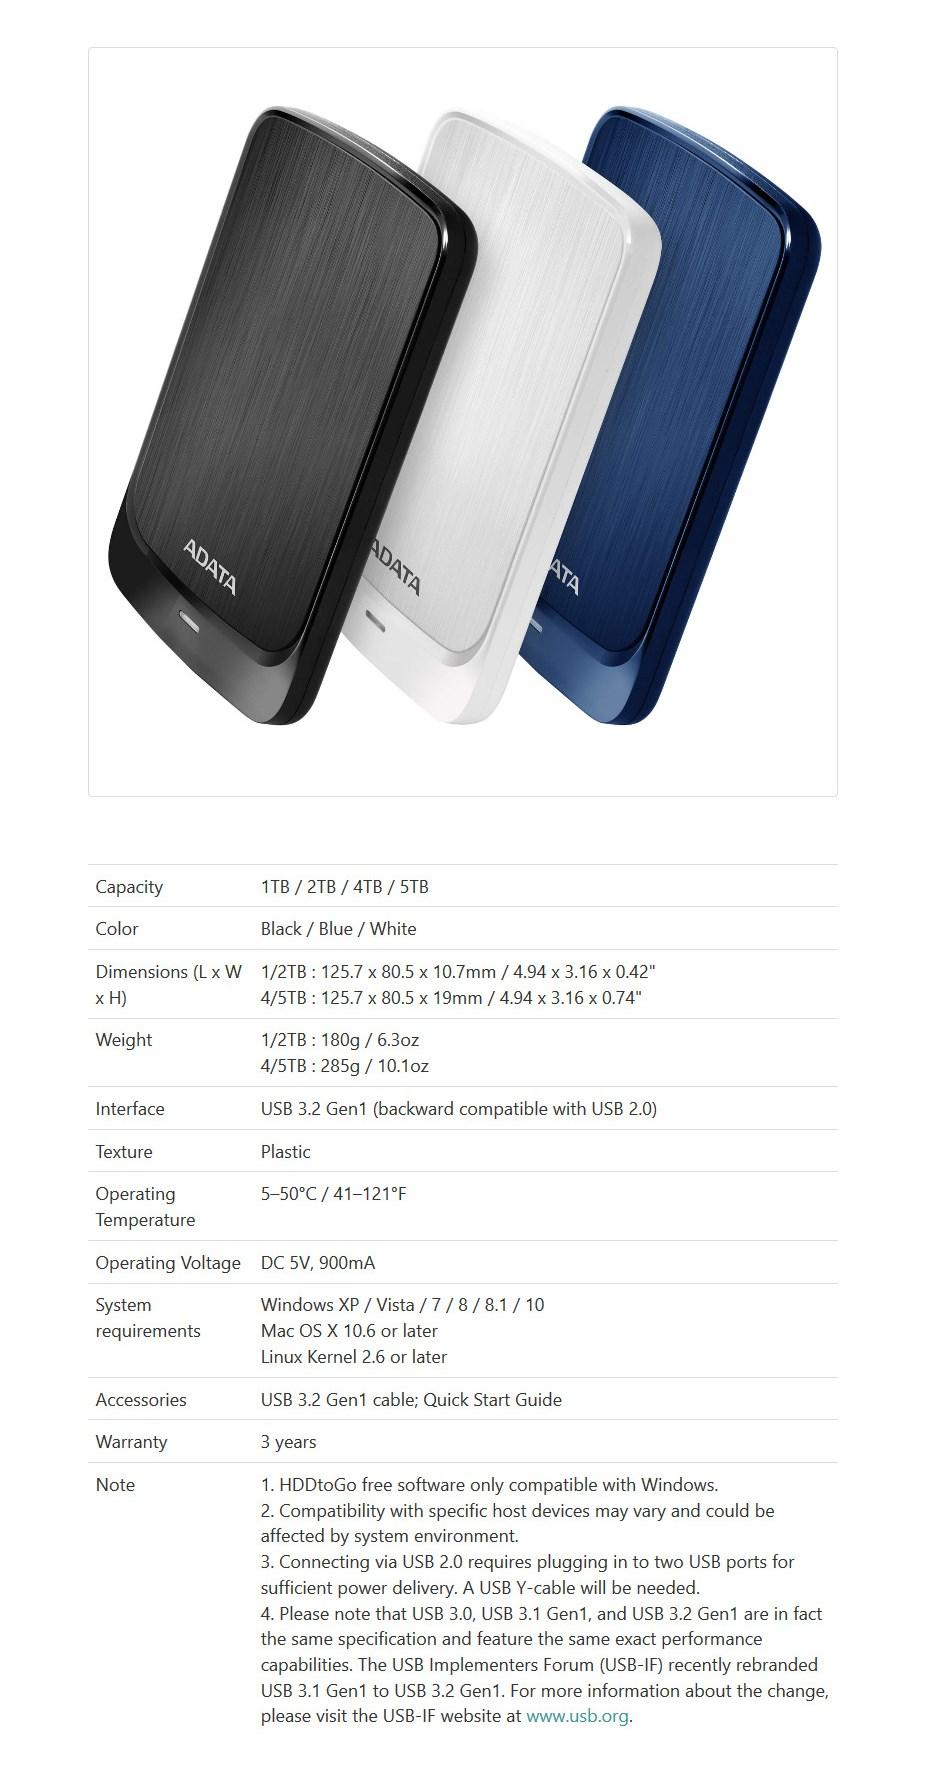 adata-fv320-1tb-usb-30-slim-portable-external-hard-drive-black-ac31652-9-2-.jpg